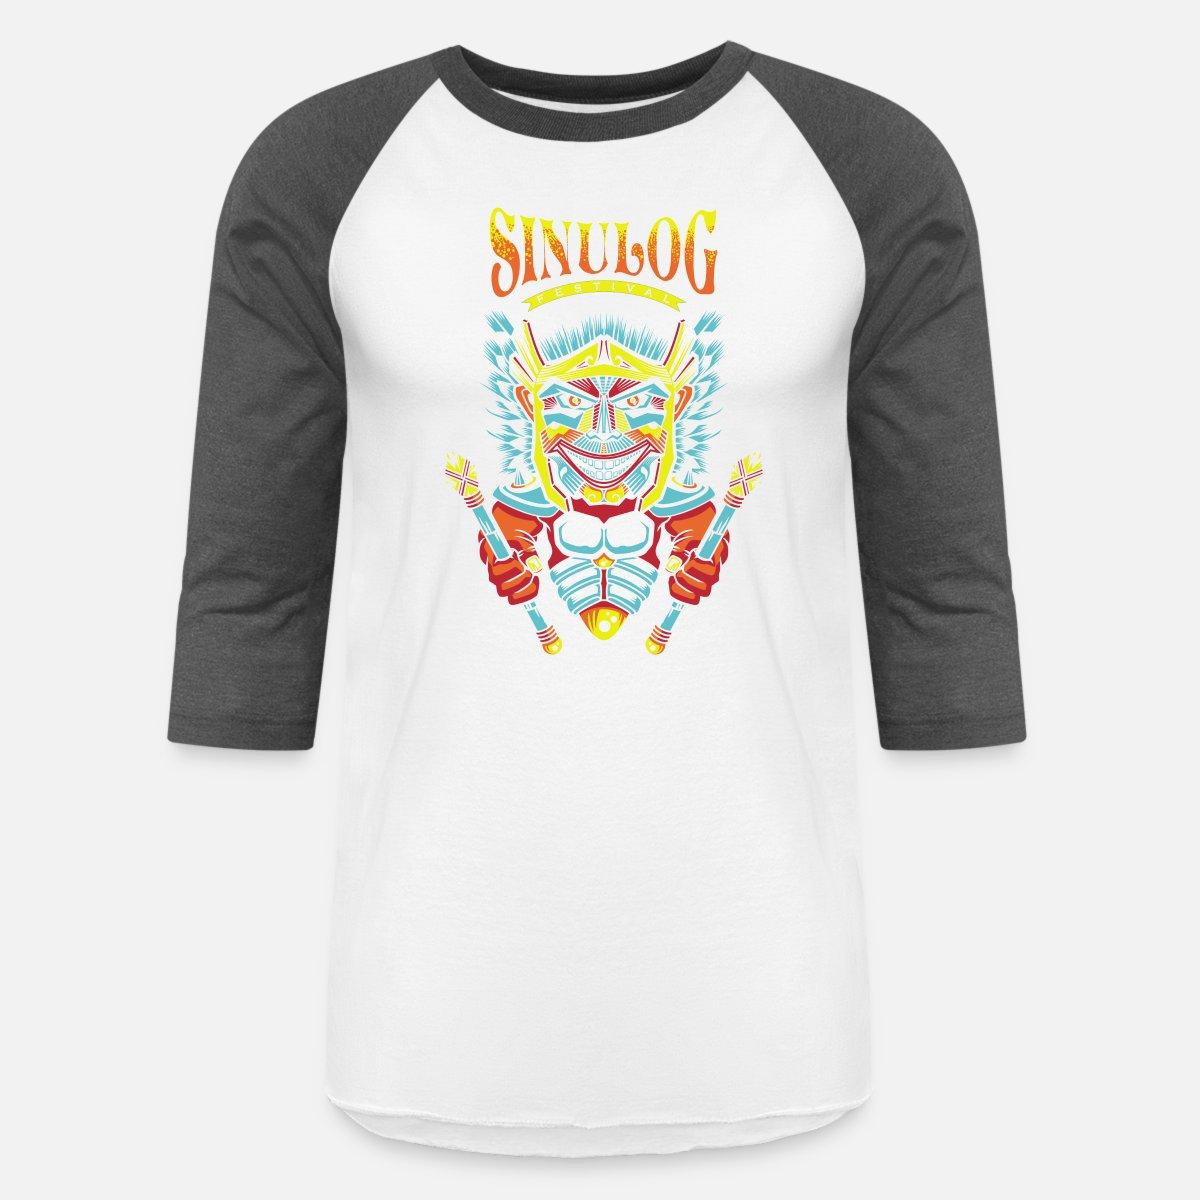 Sinulog 2020 T Shirt Design